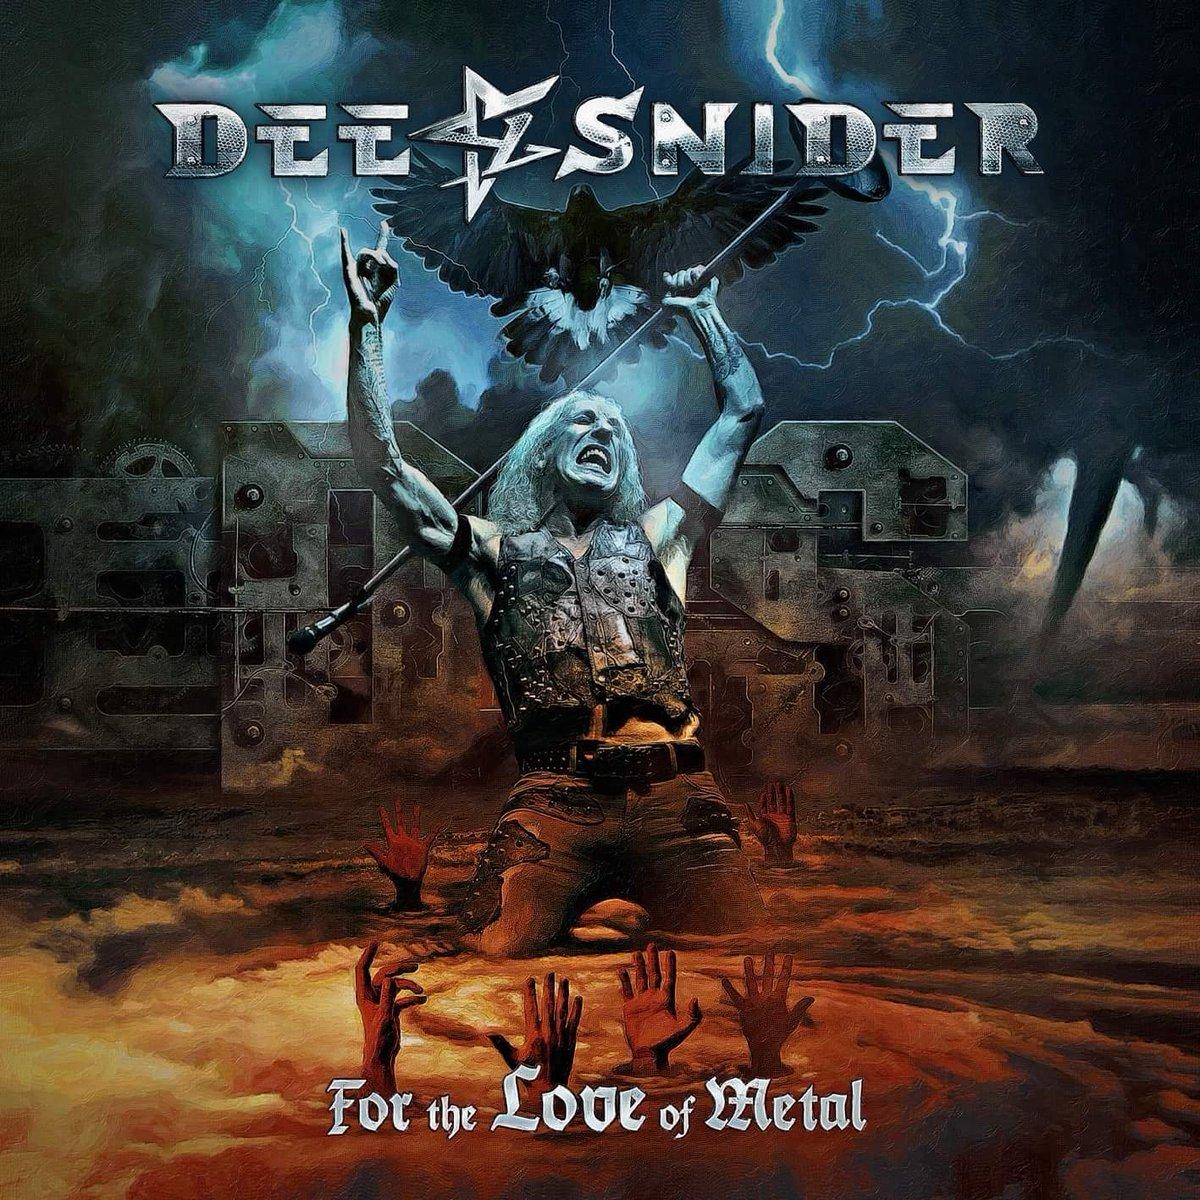 dee-snider-for-love-of-metal-album-art.jpg